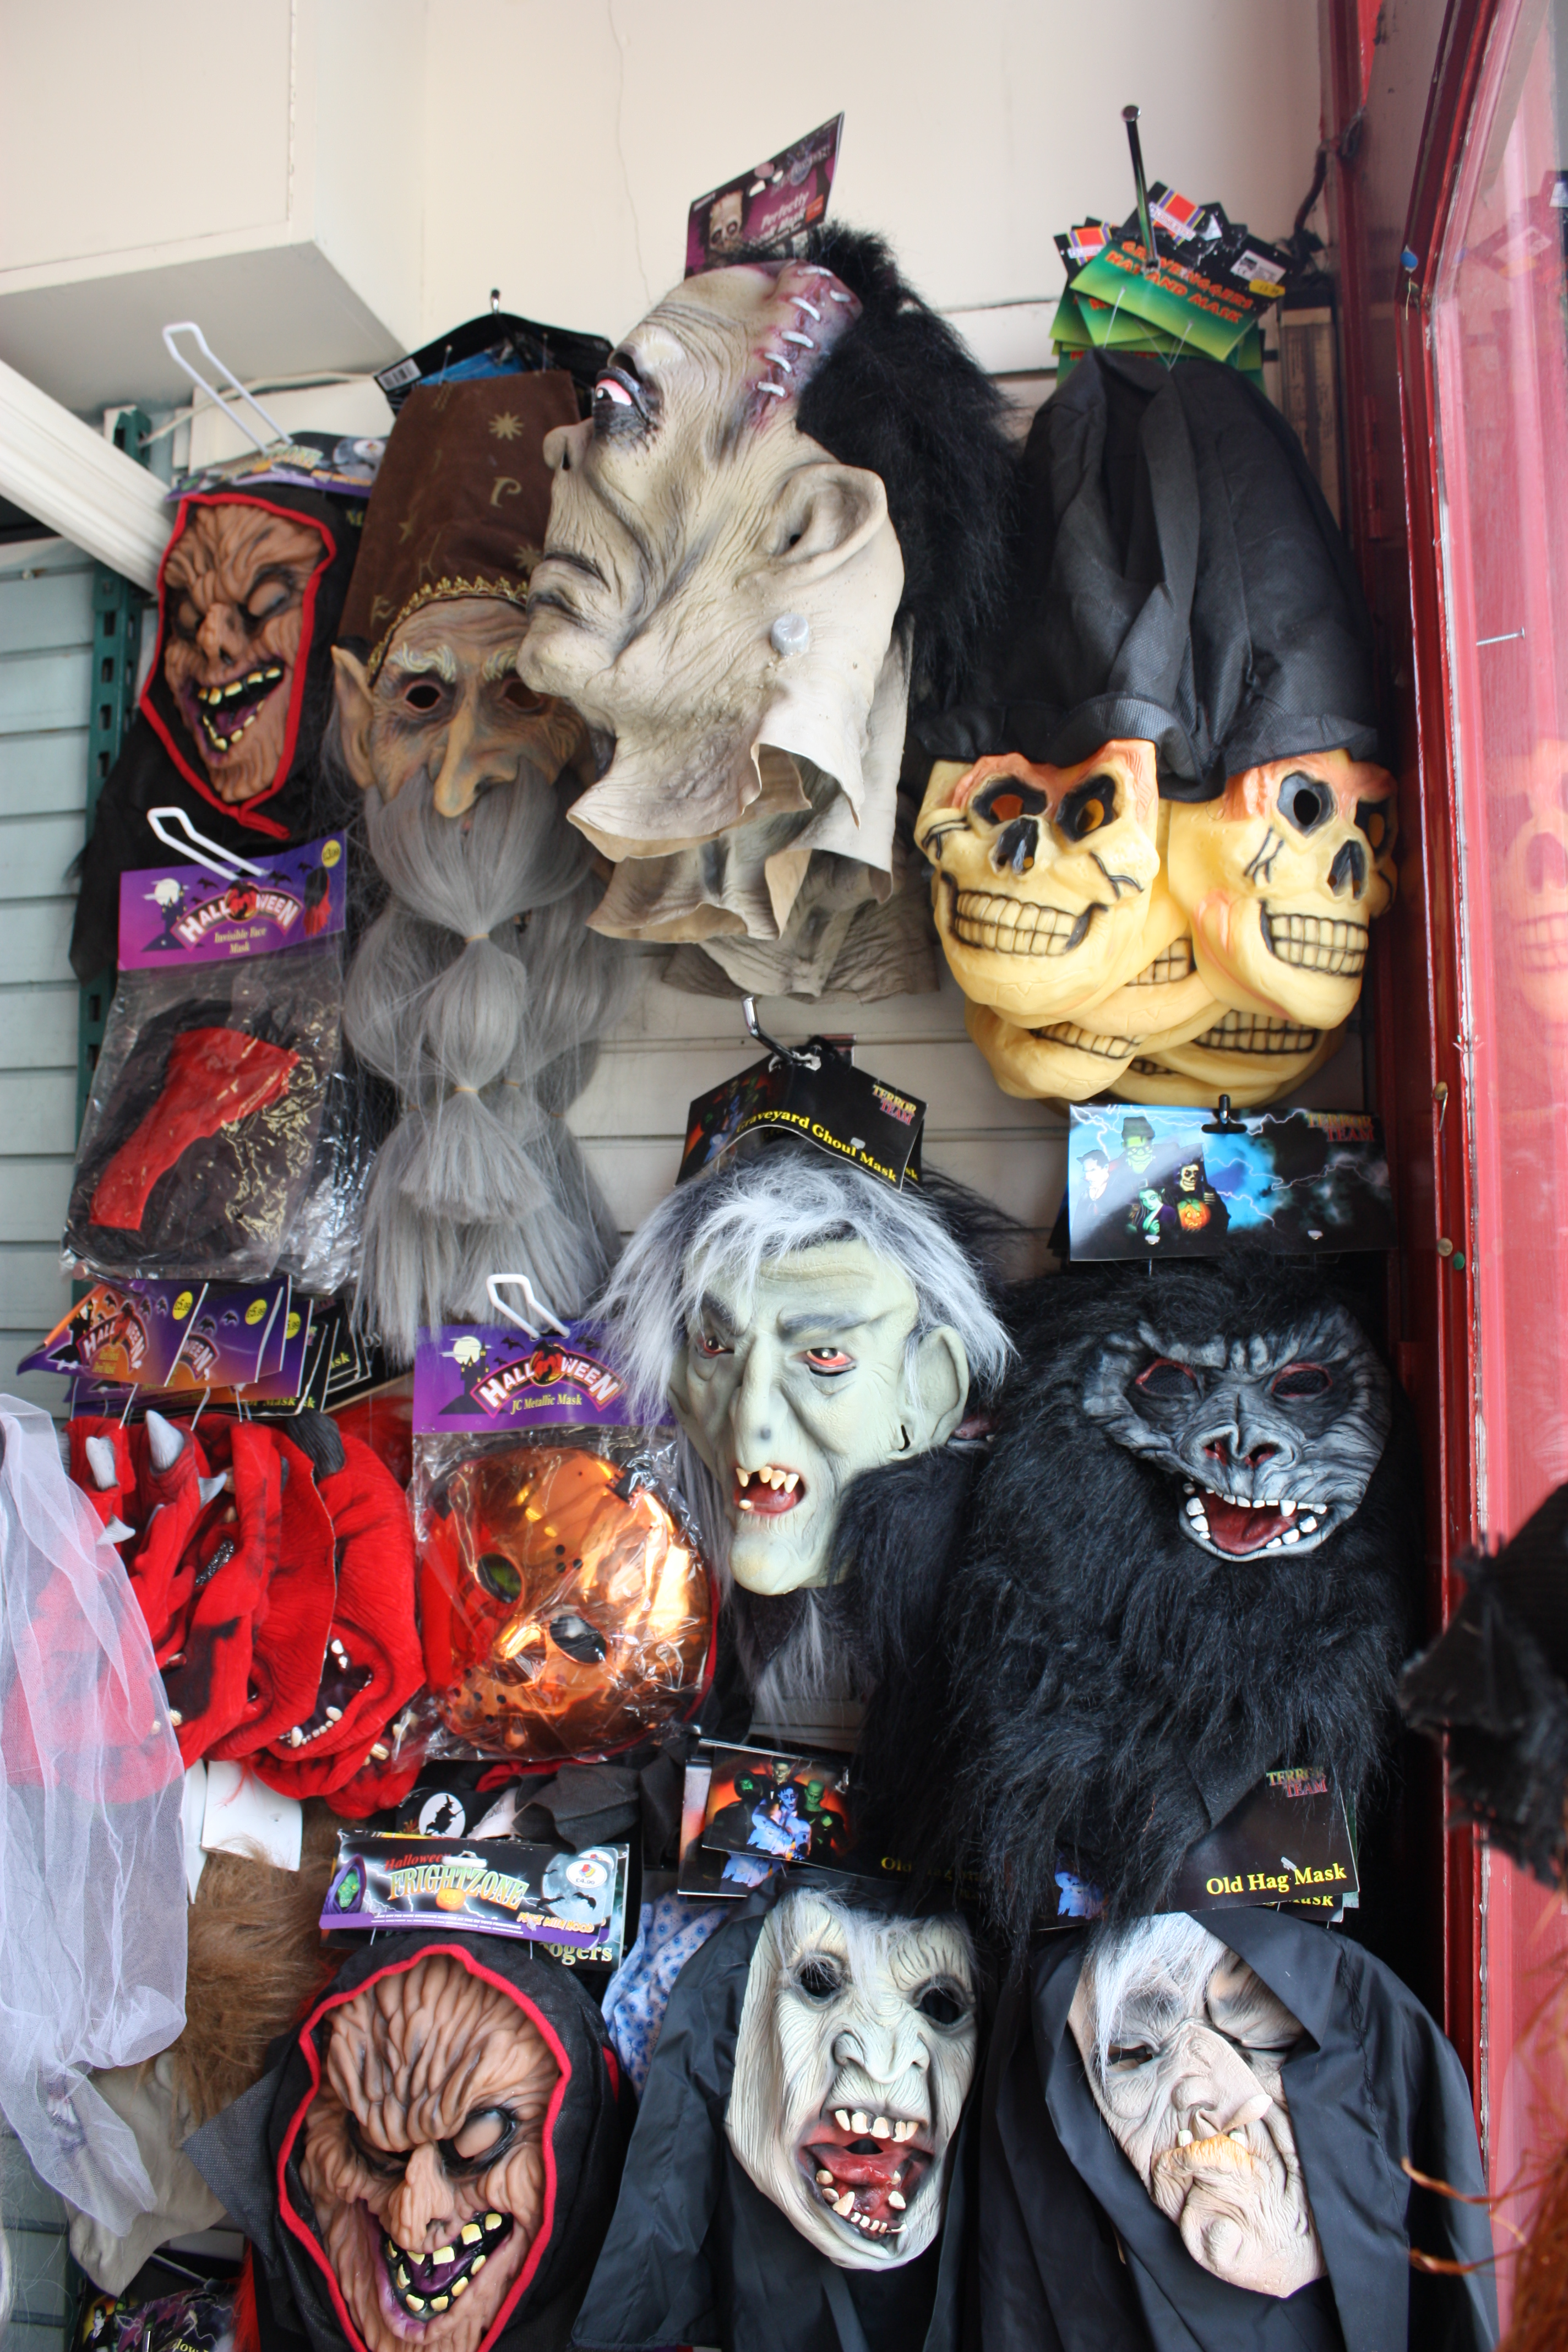 File:Halloween Shop, Derry, September 2010 (02).JPG - Wikimedia ...